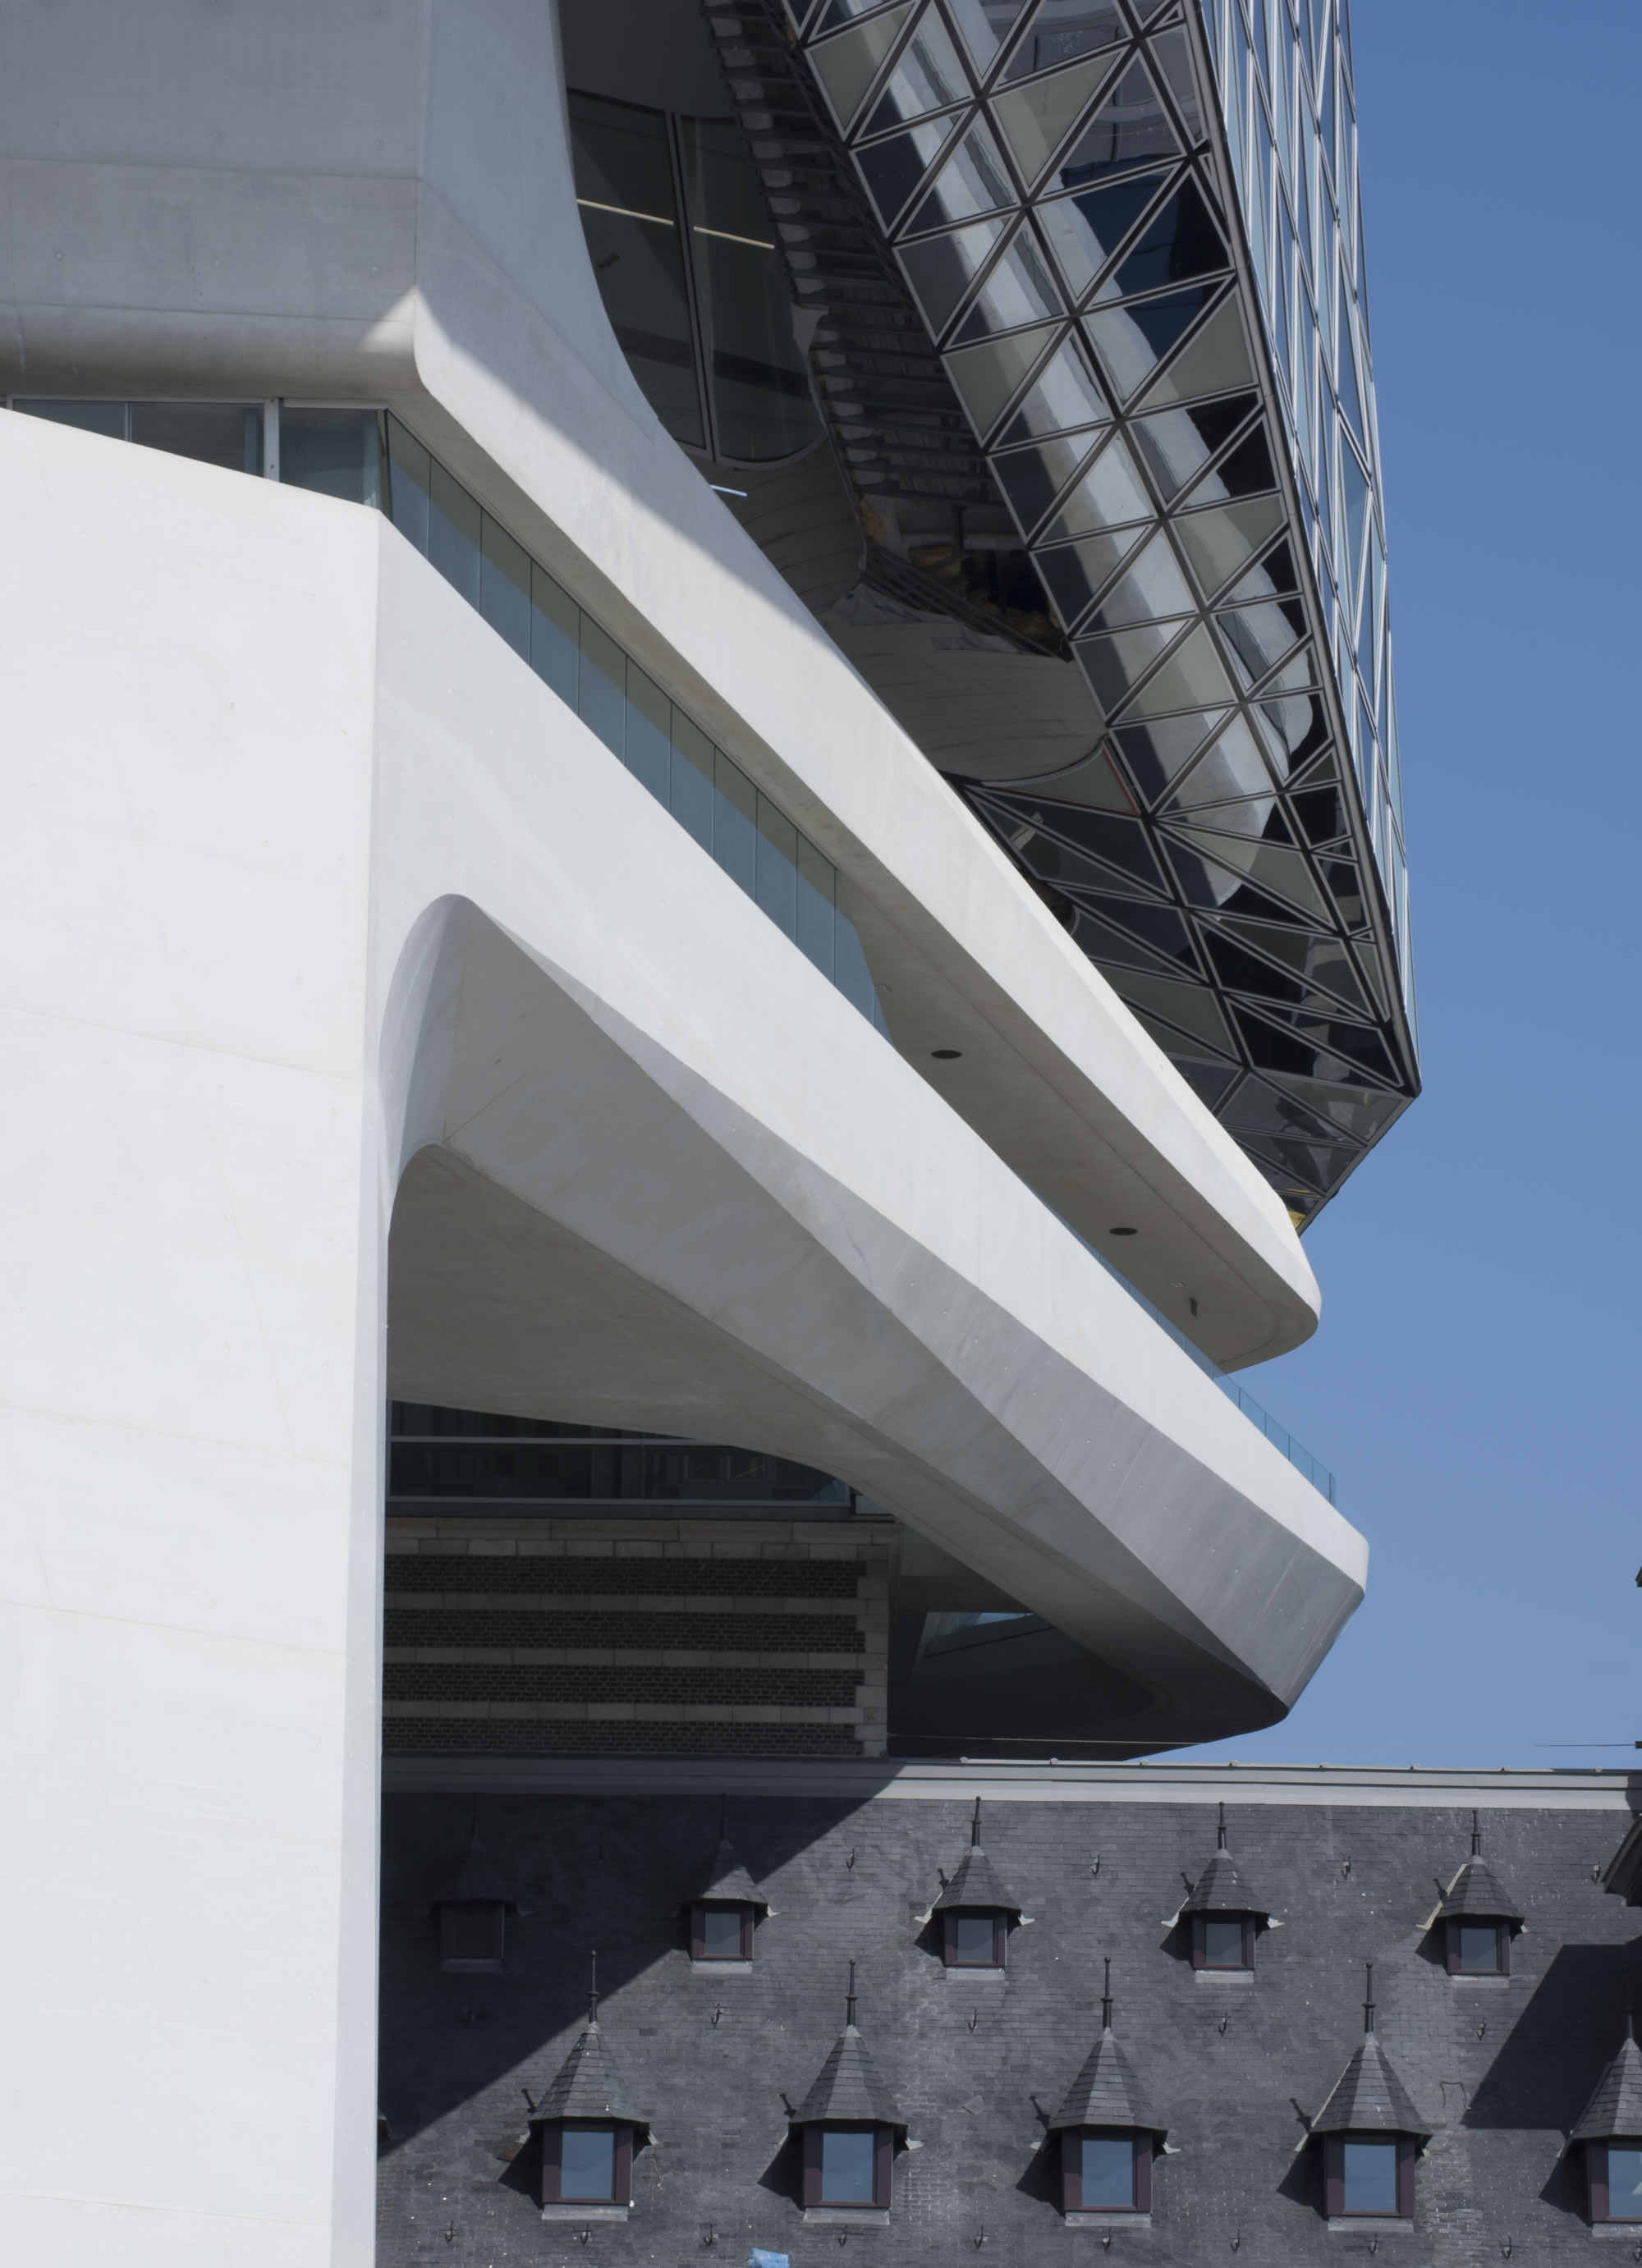 ZHA_Port House Antwerp_Detail of concrete structure ∏ Tim Fisher 2016.jpg